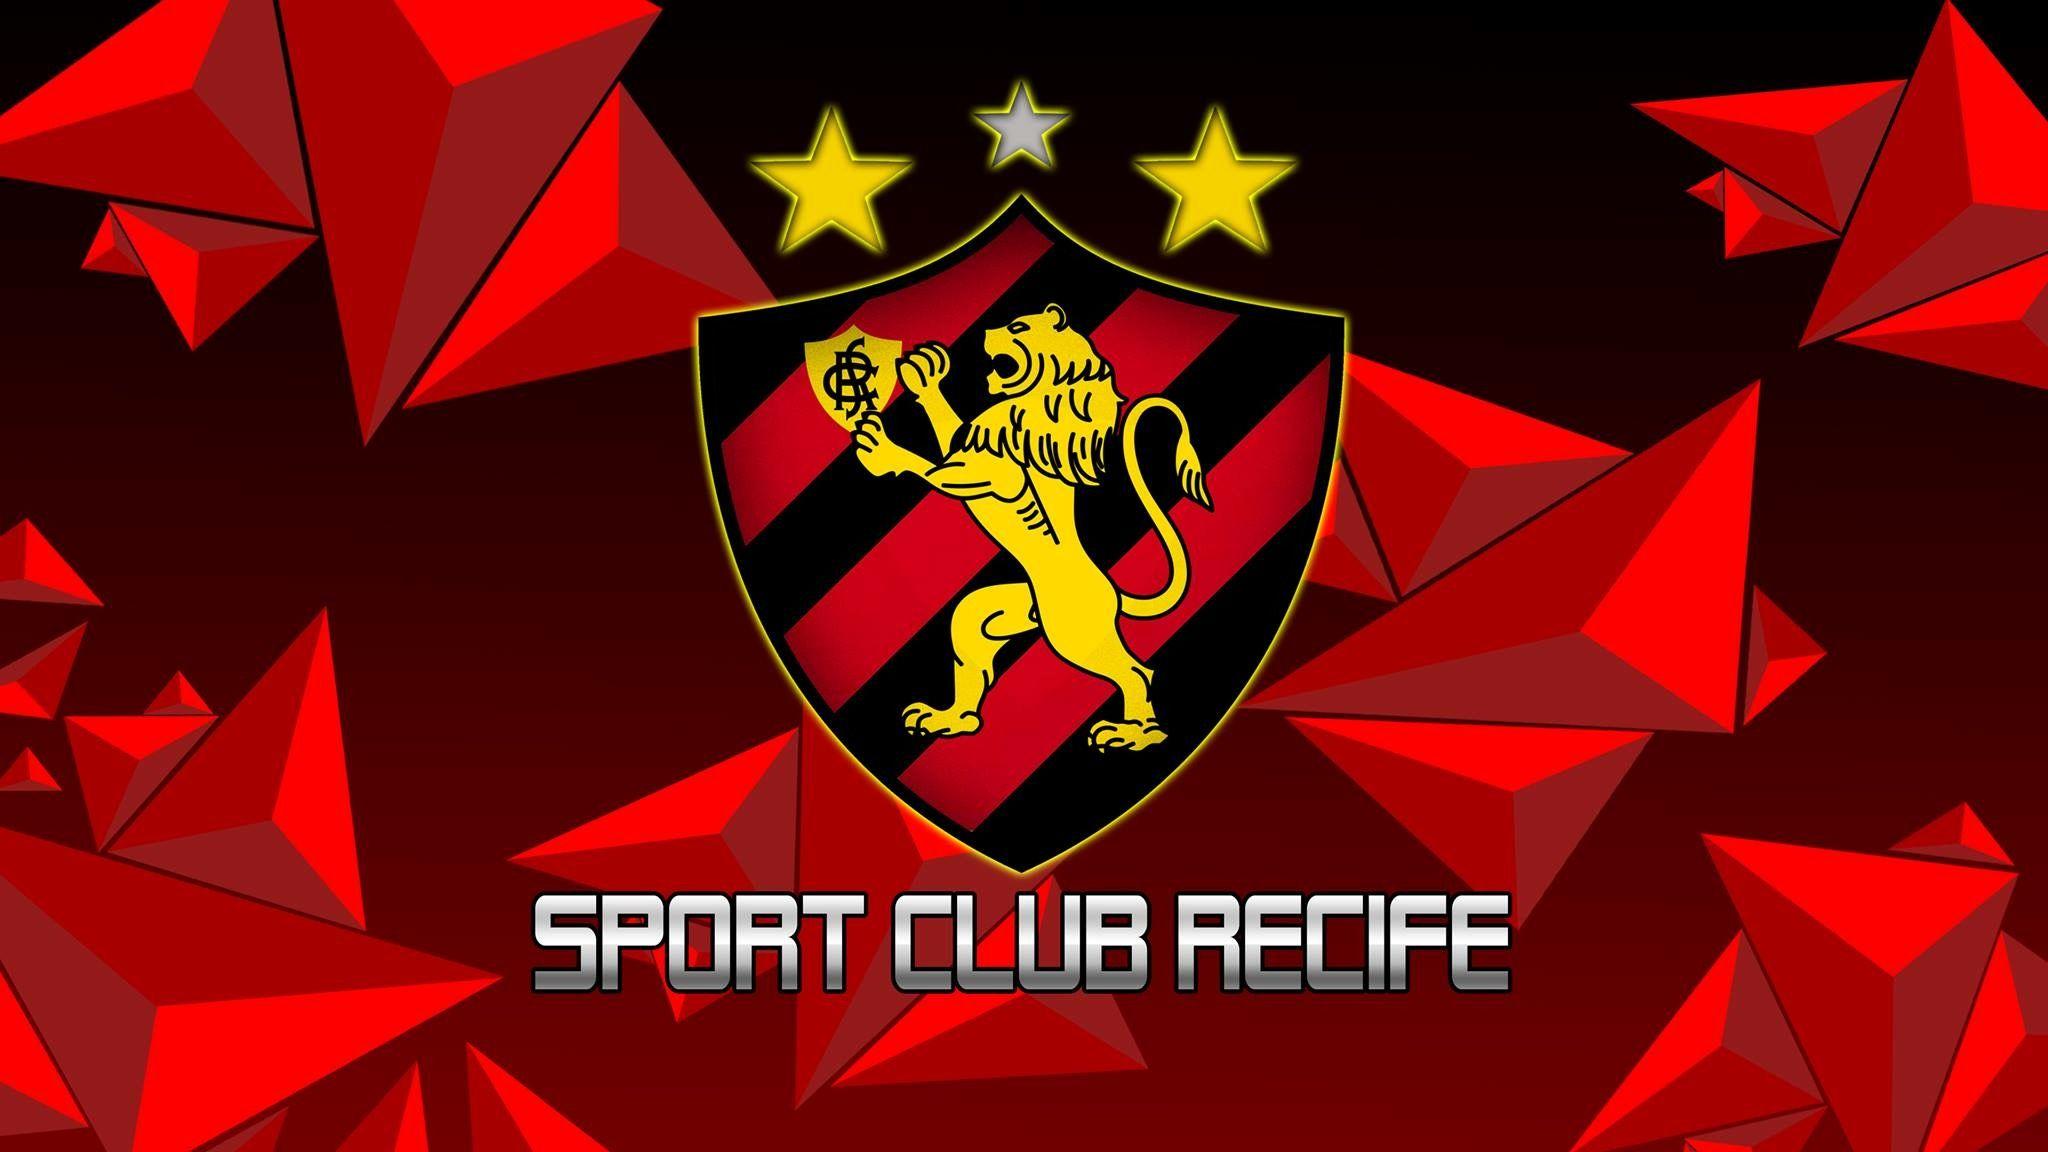 Pin de Cleiton paulino em Sport ️ Sport clube recife